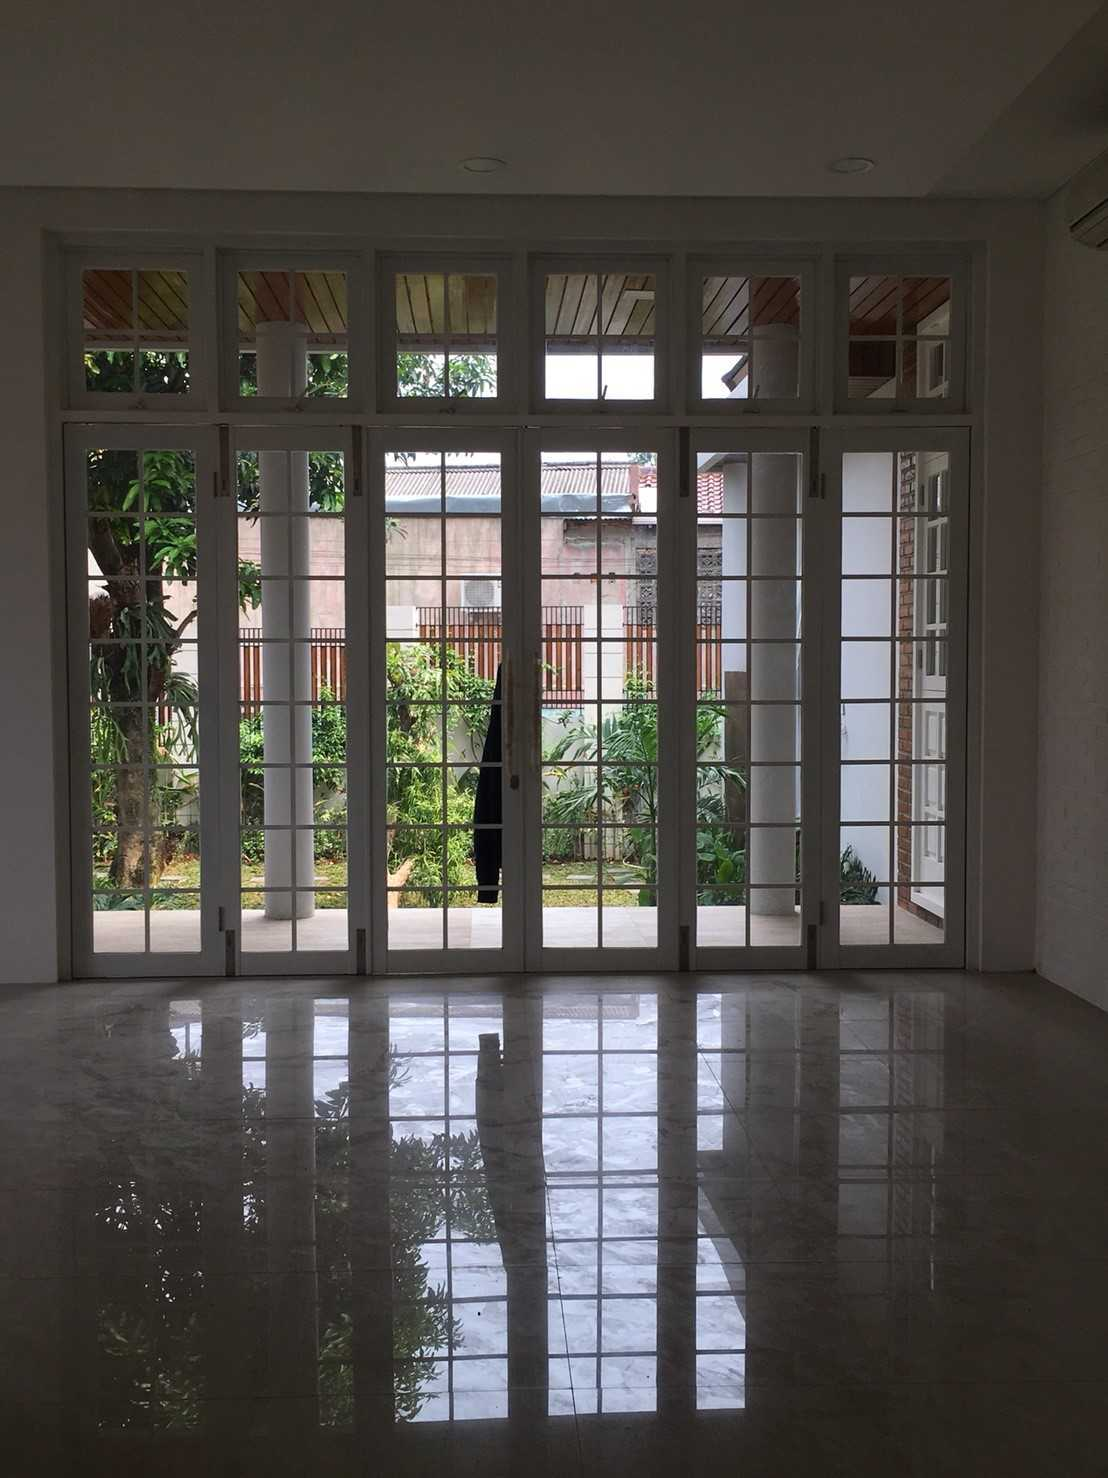 Ho.la Studio Arsitektur K House Bekasi Bar., Kota Bks, Jawa Barat, Indonesia Bekasi Bar., Kota Bks, Jawa Barat, Indonesia Hola-Studio-Arsitektur-K-House  68924